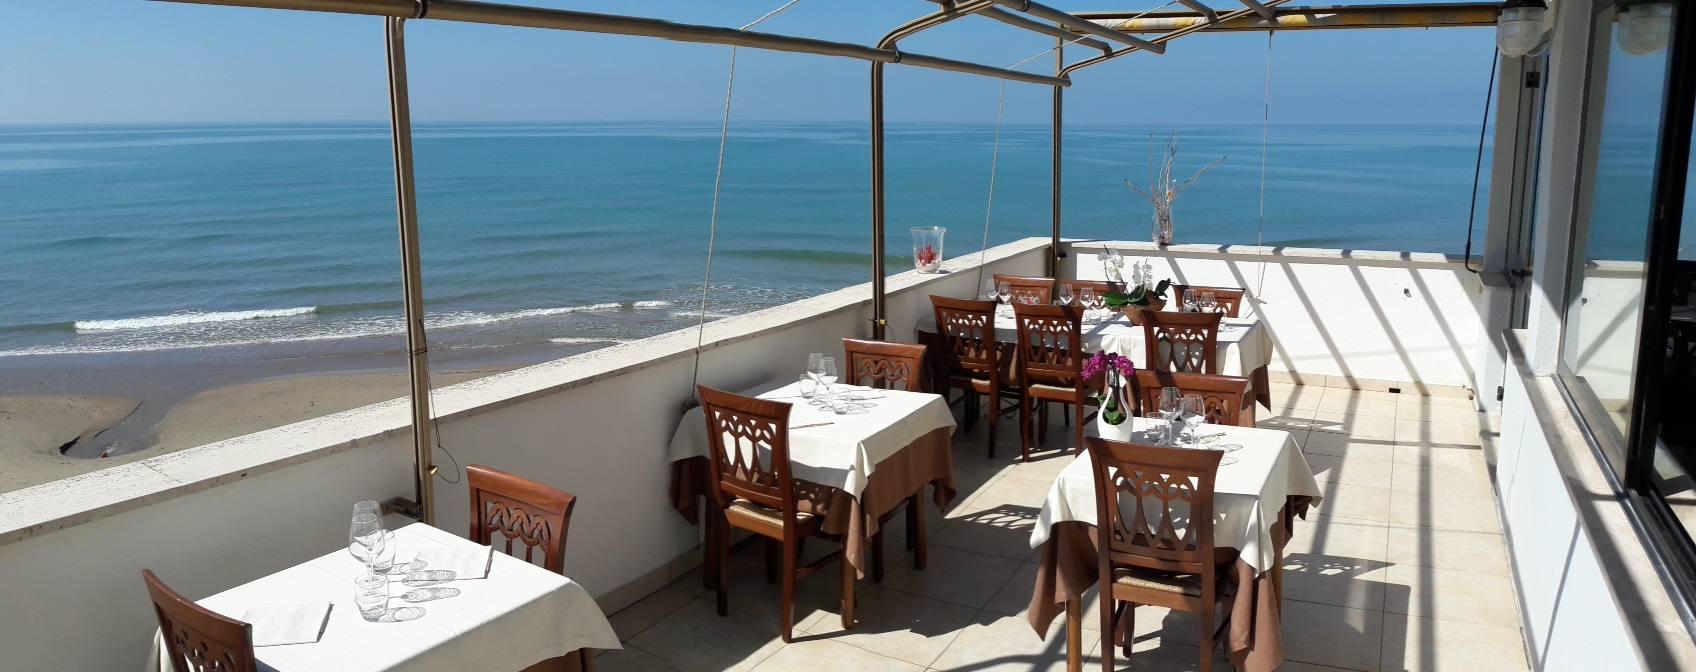 ristorante ar marinaro 1